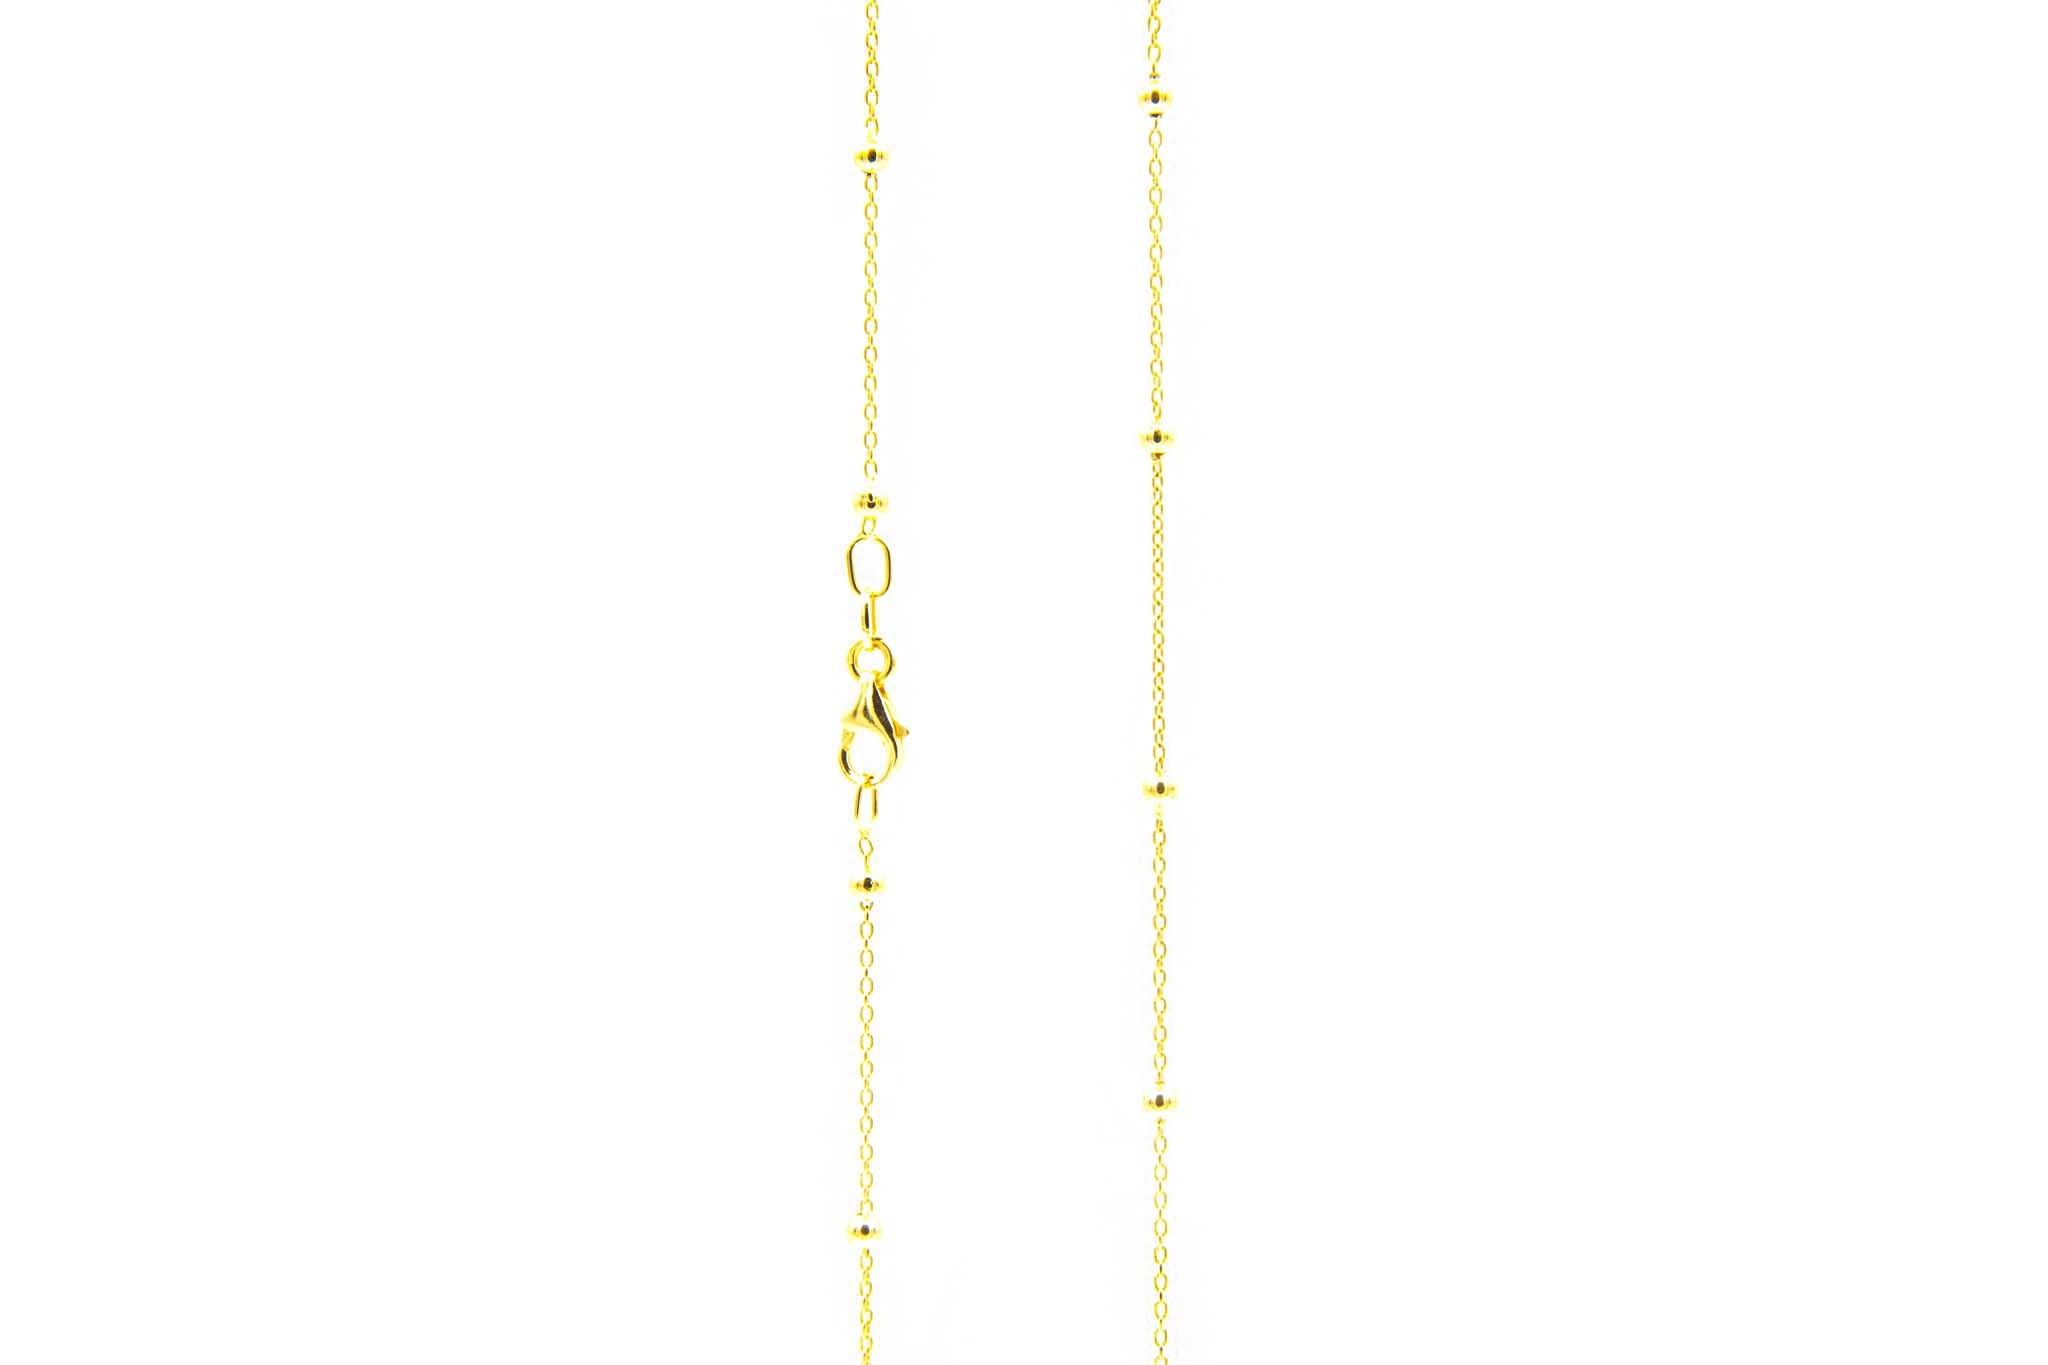 Ketting subtiele chain met balletjes-3